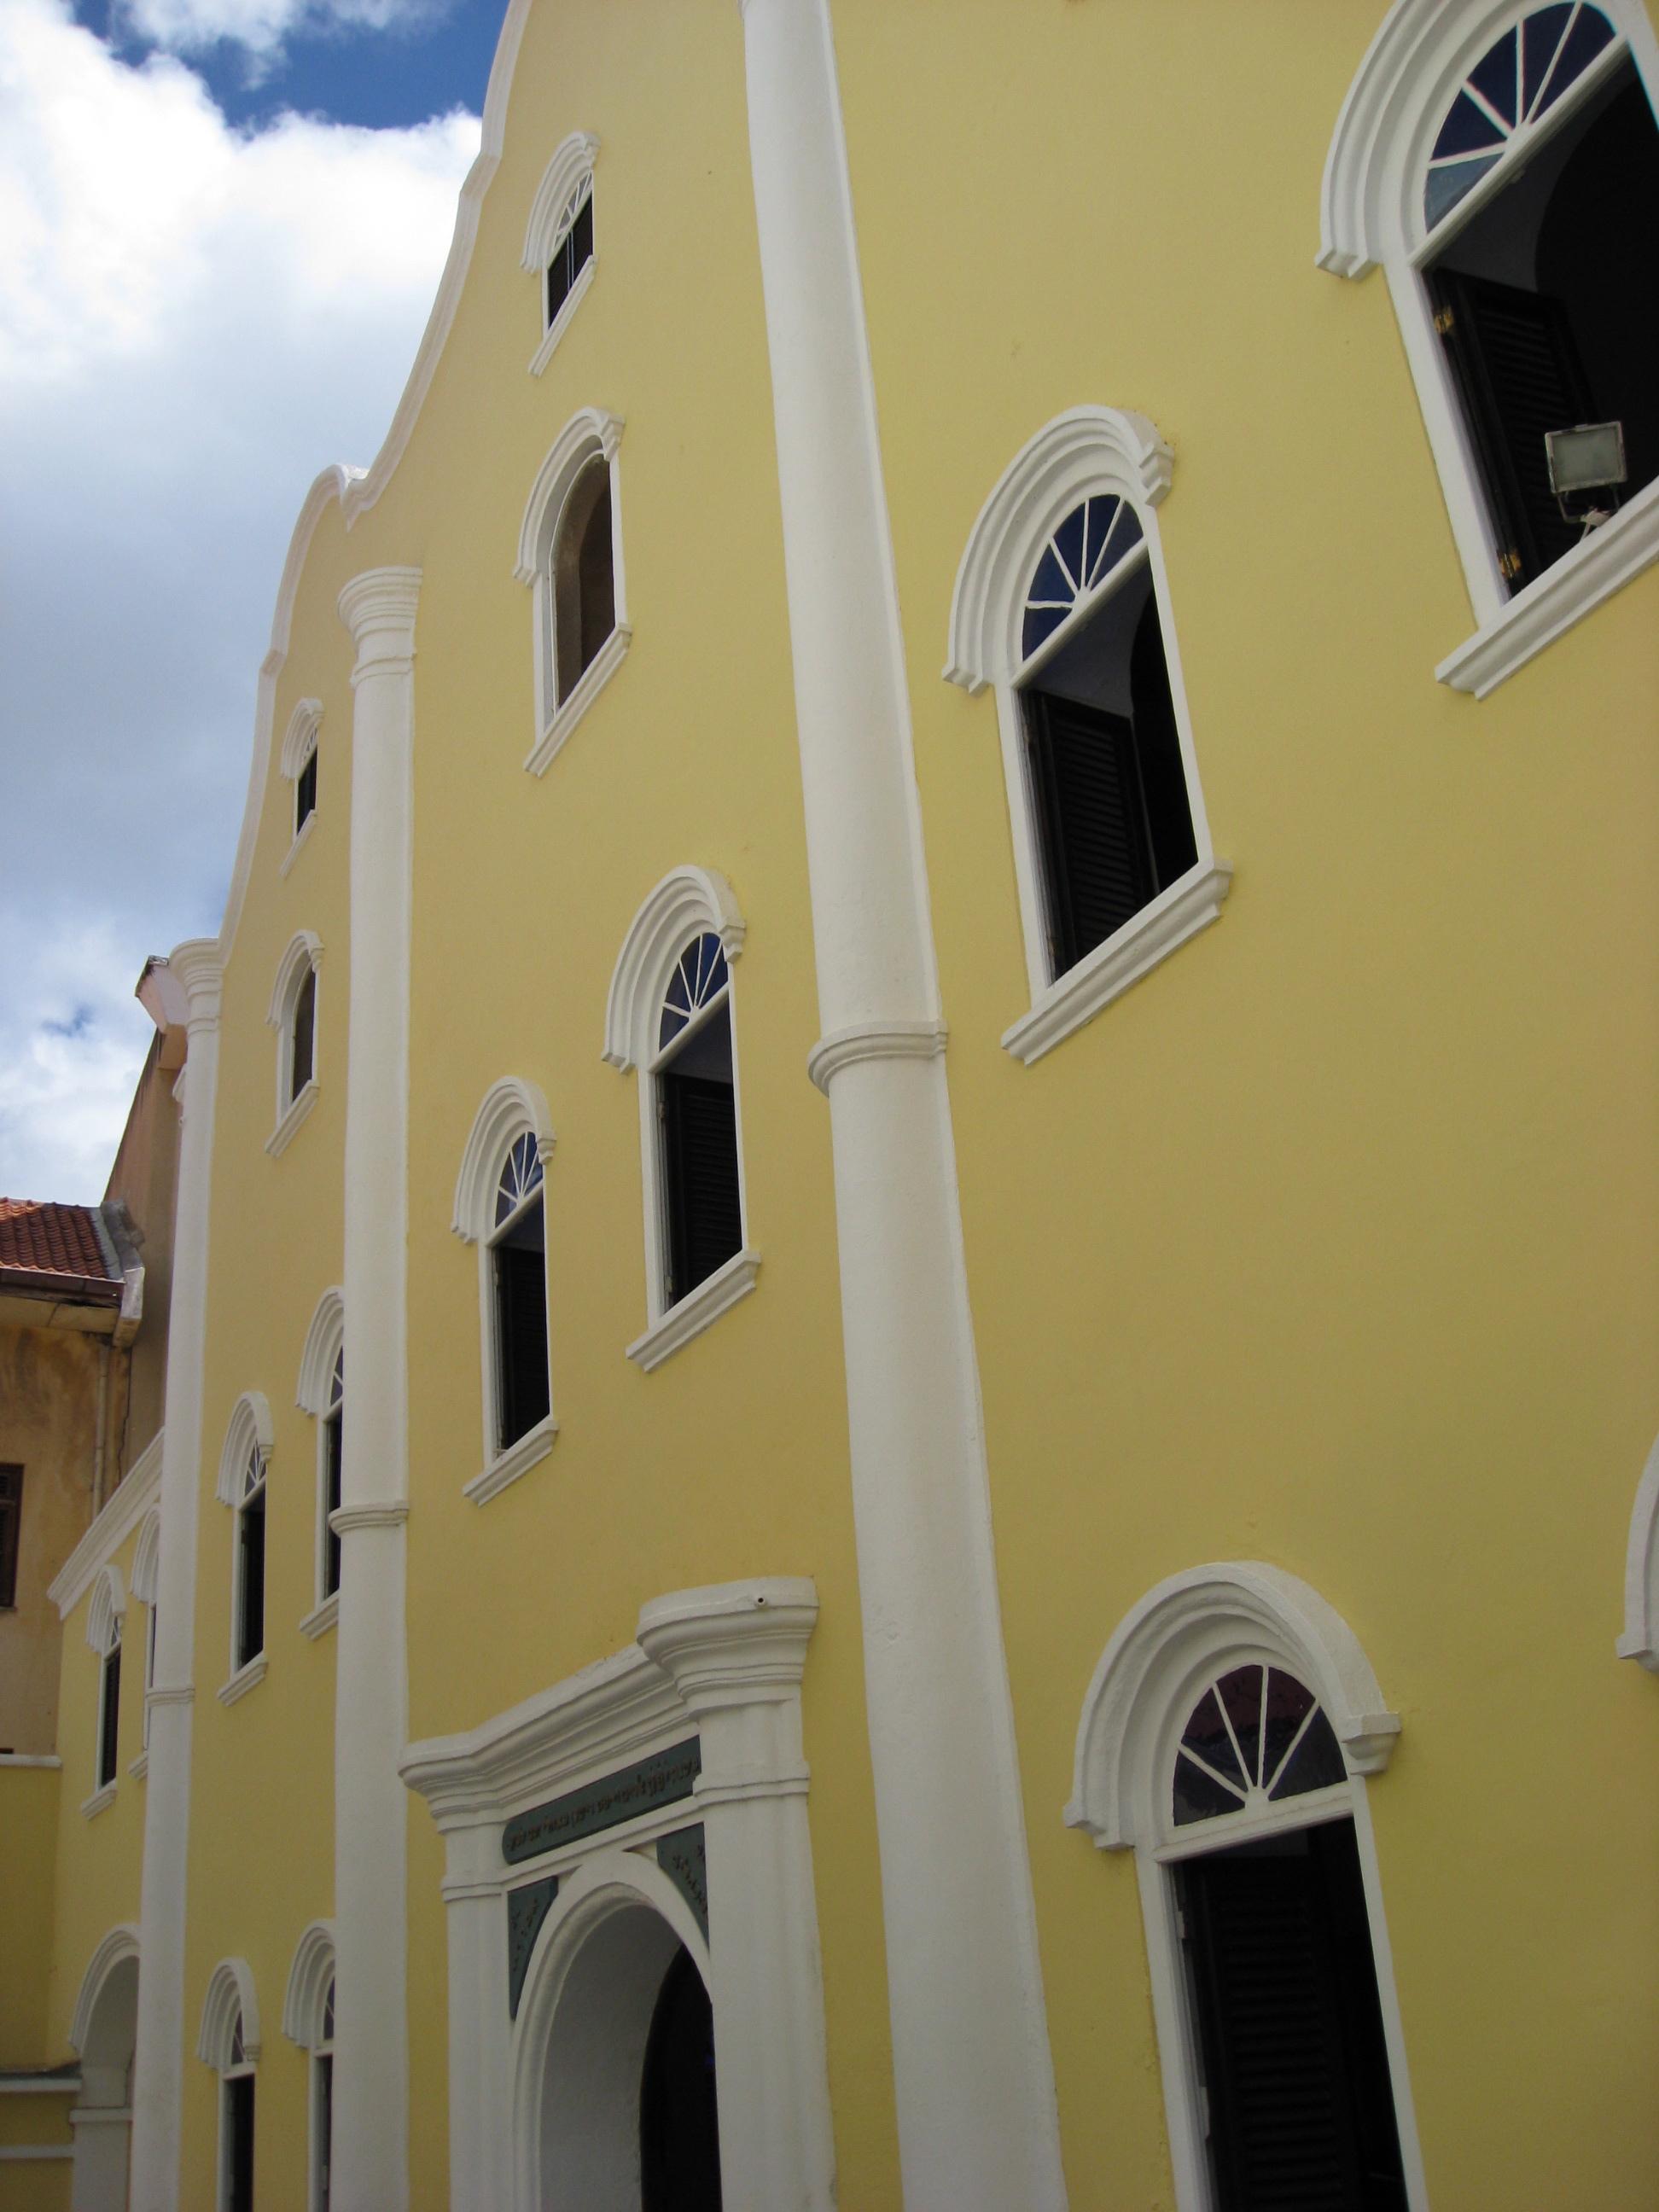 Curaçao synagogue - Wikipedia